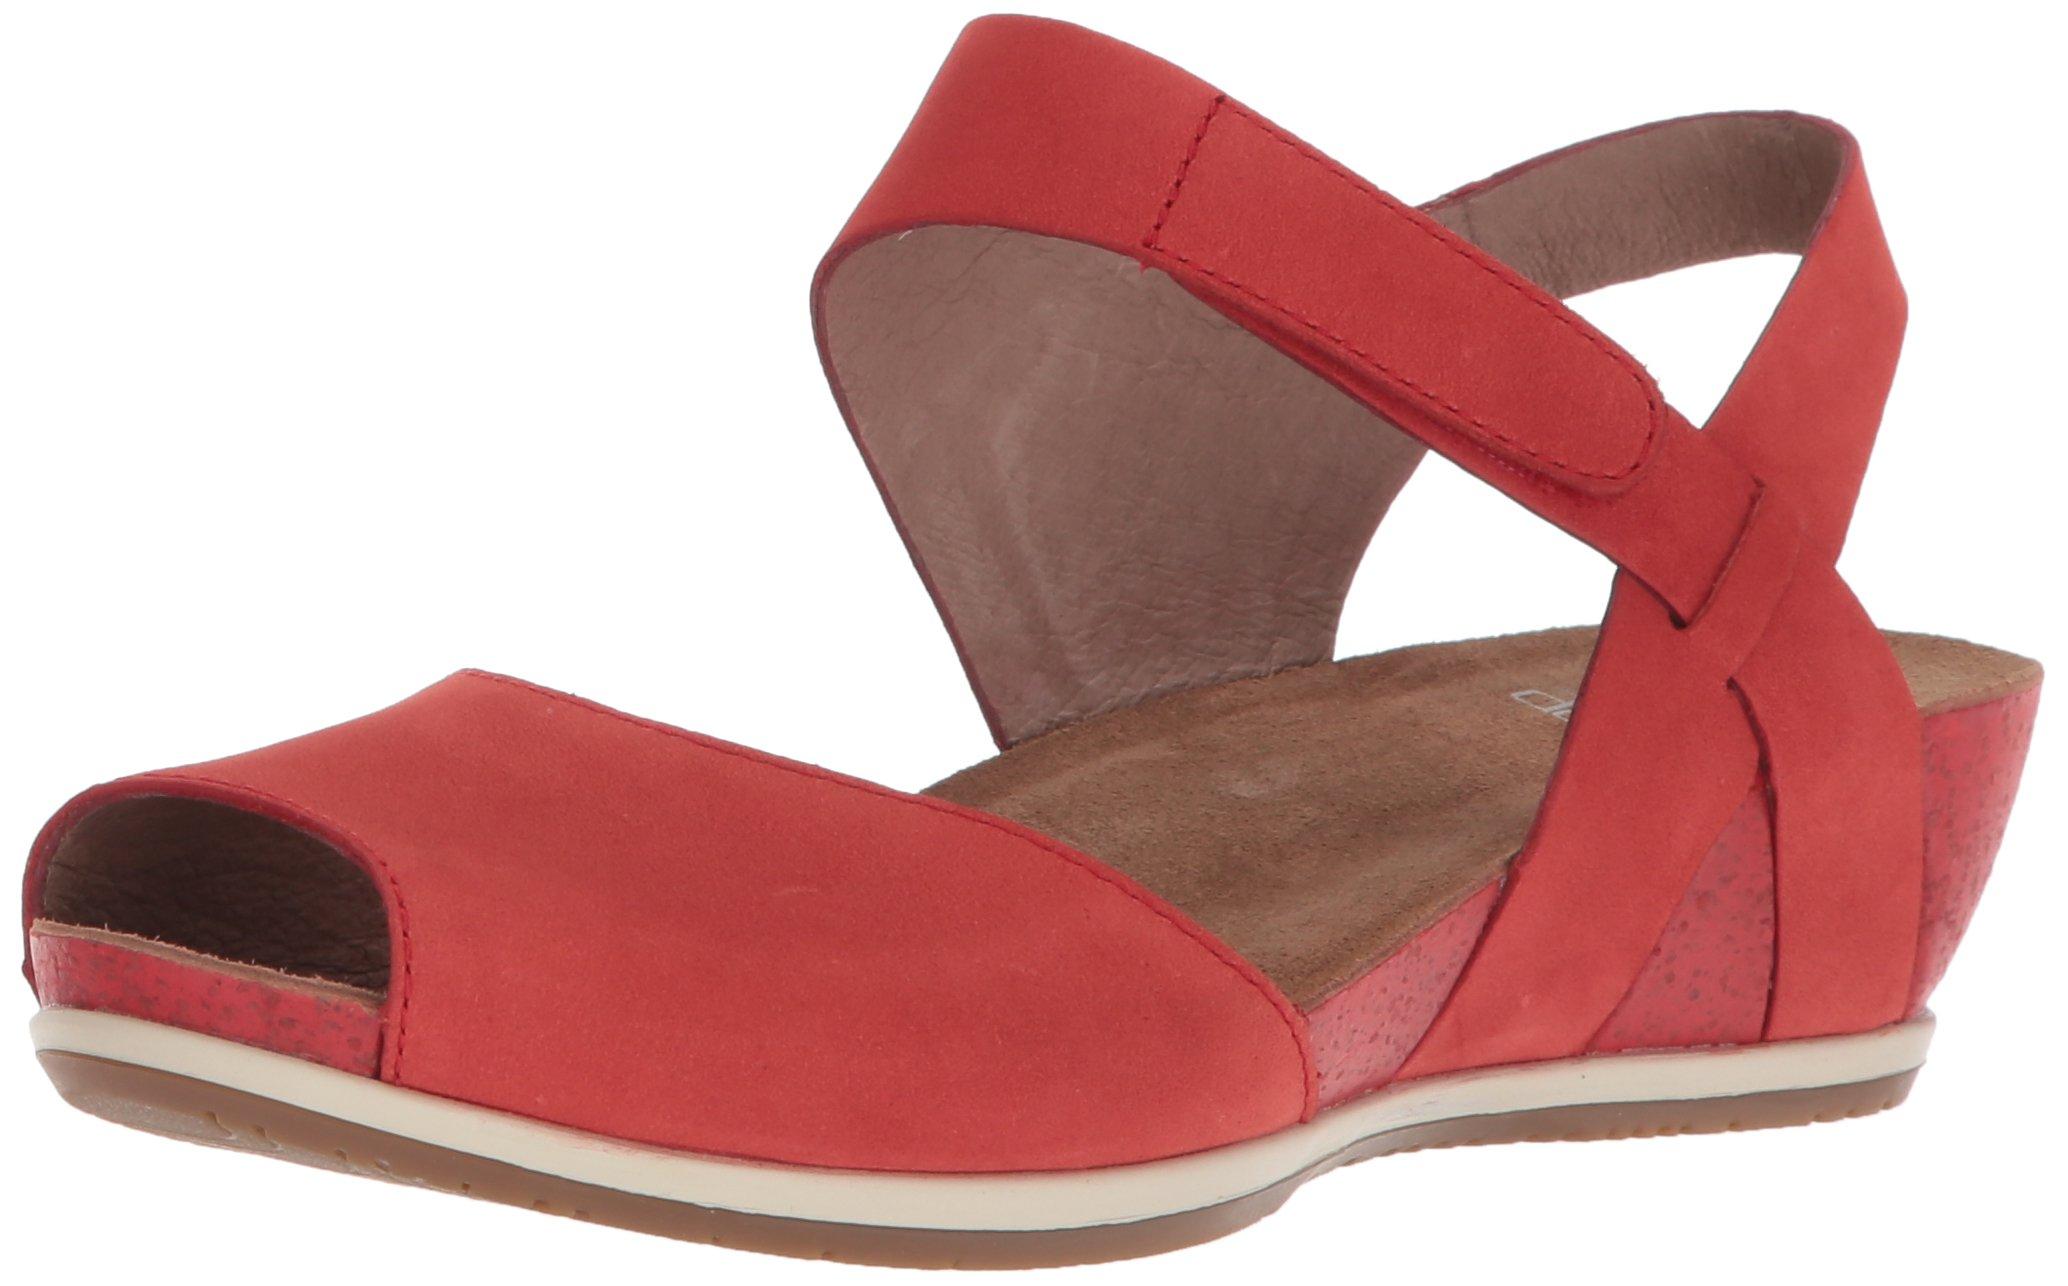 Dansko Women's Vera Flat Sandal, Tomato Milled Nubuck, 40 M EU (9.5-10 US)